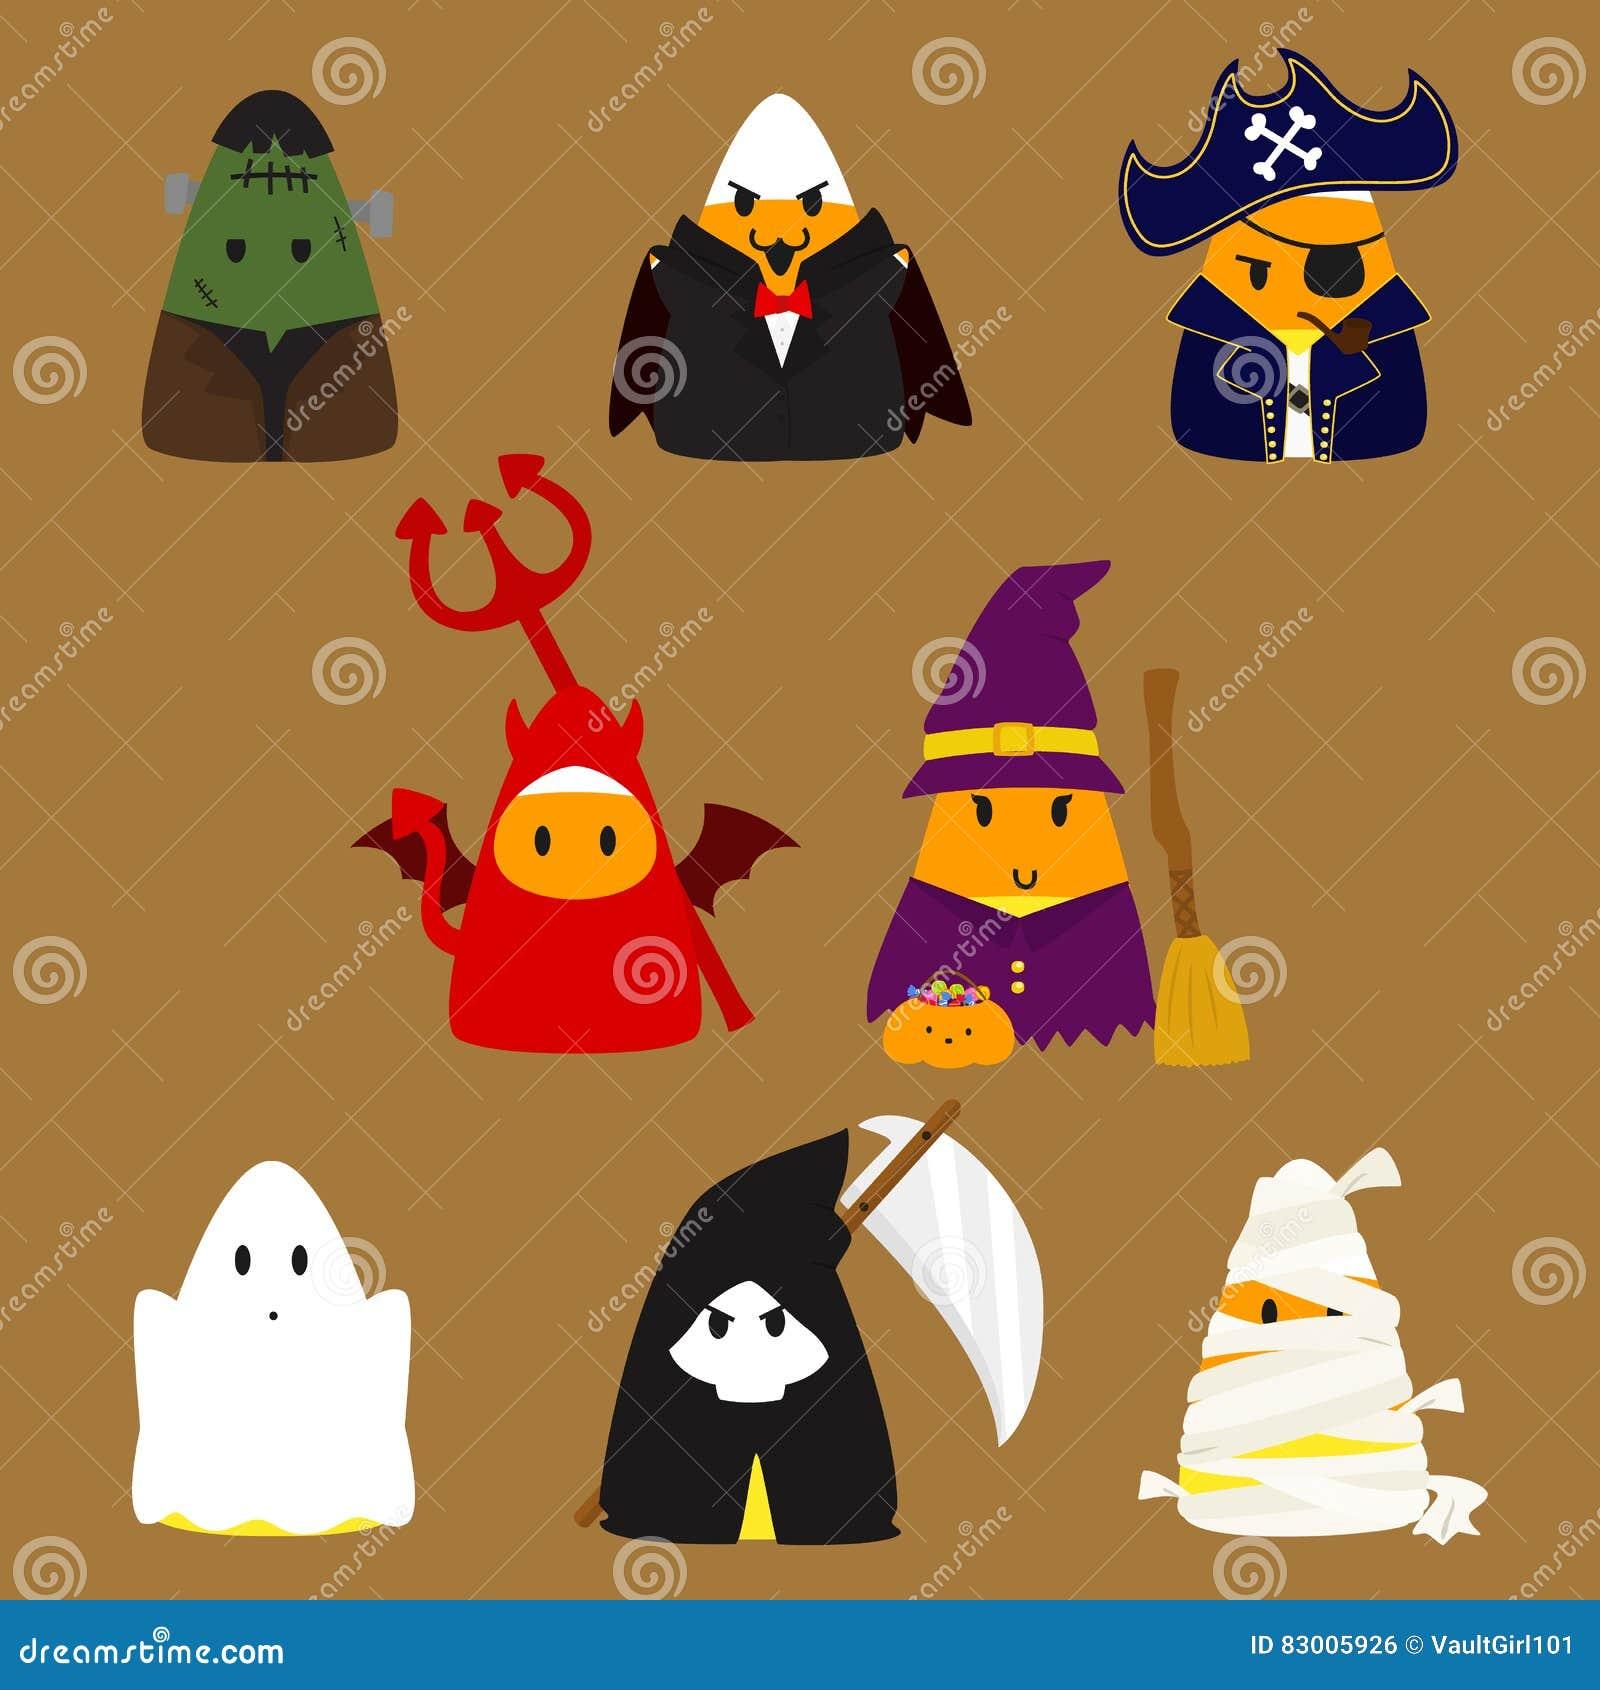 Candy Corn Halloween Costumes Vector Set